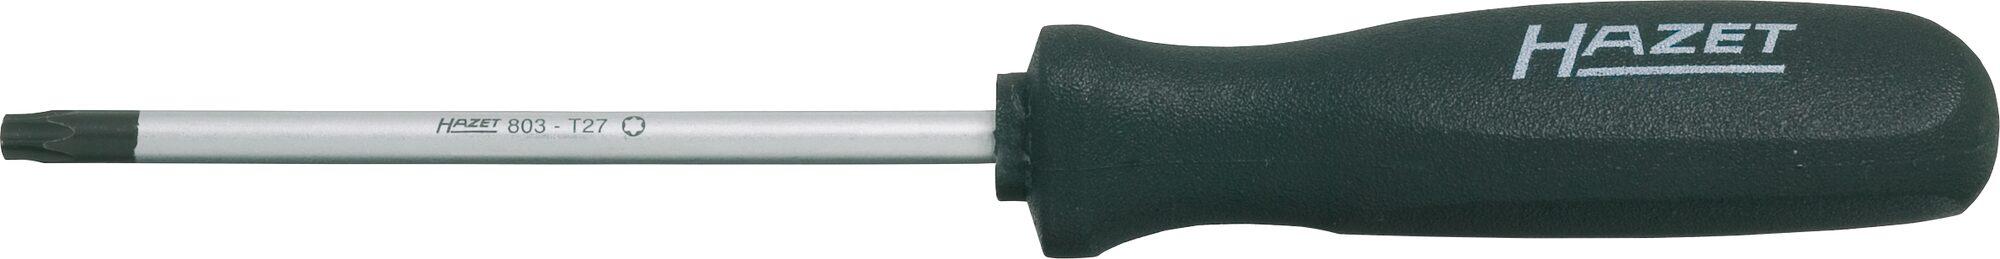 HAZET Schraubendreher trinamic 803-T8 ∙ Innen TORX® Profil ∙ T8